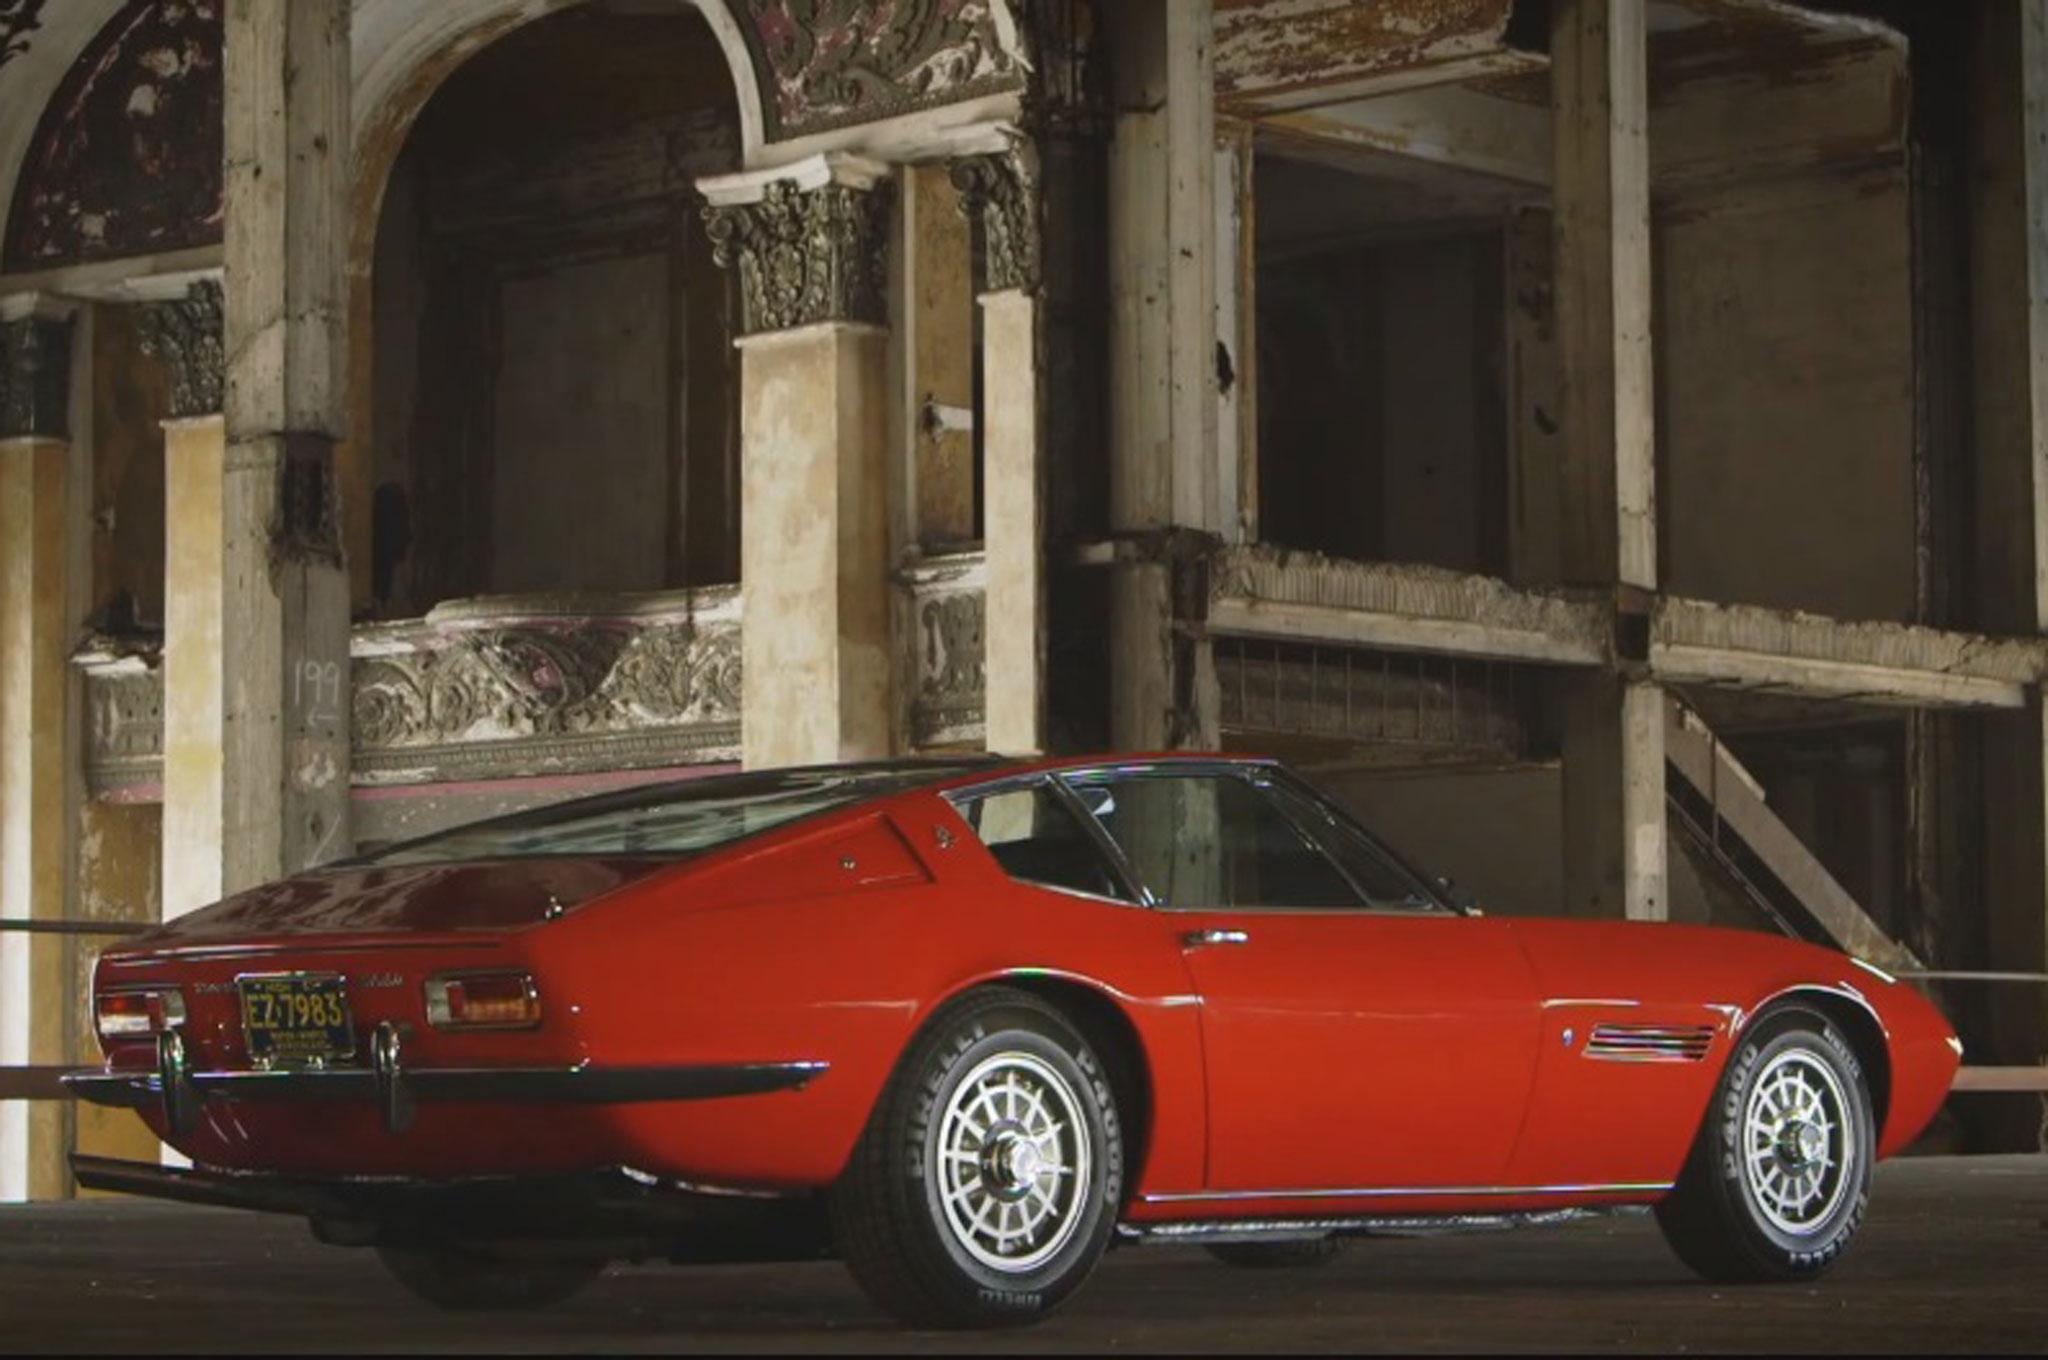 1967 Maserati Ghibli Rear Three Quarter